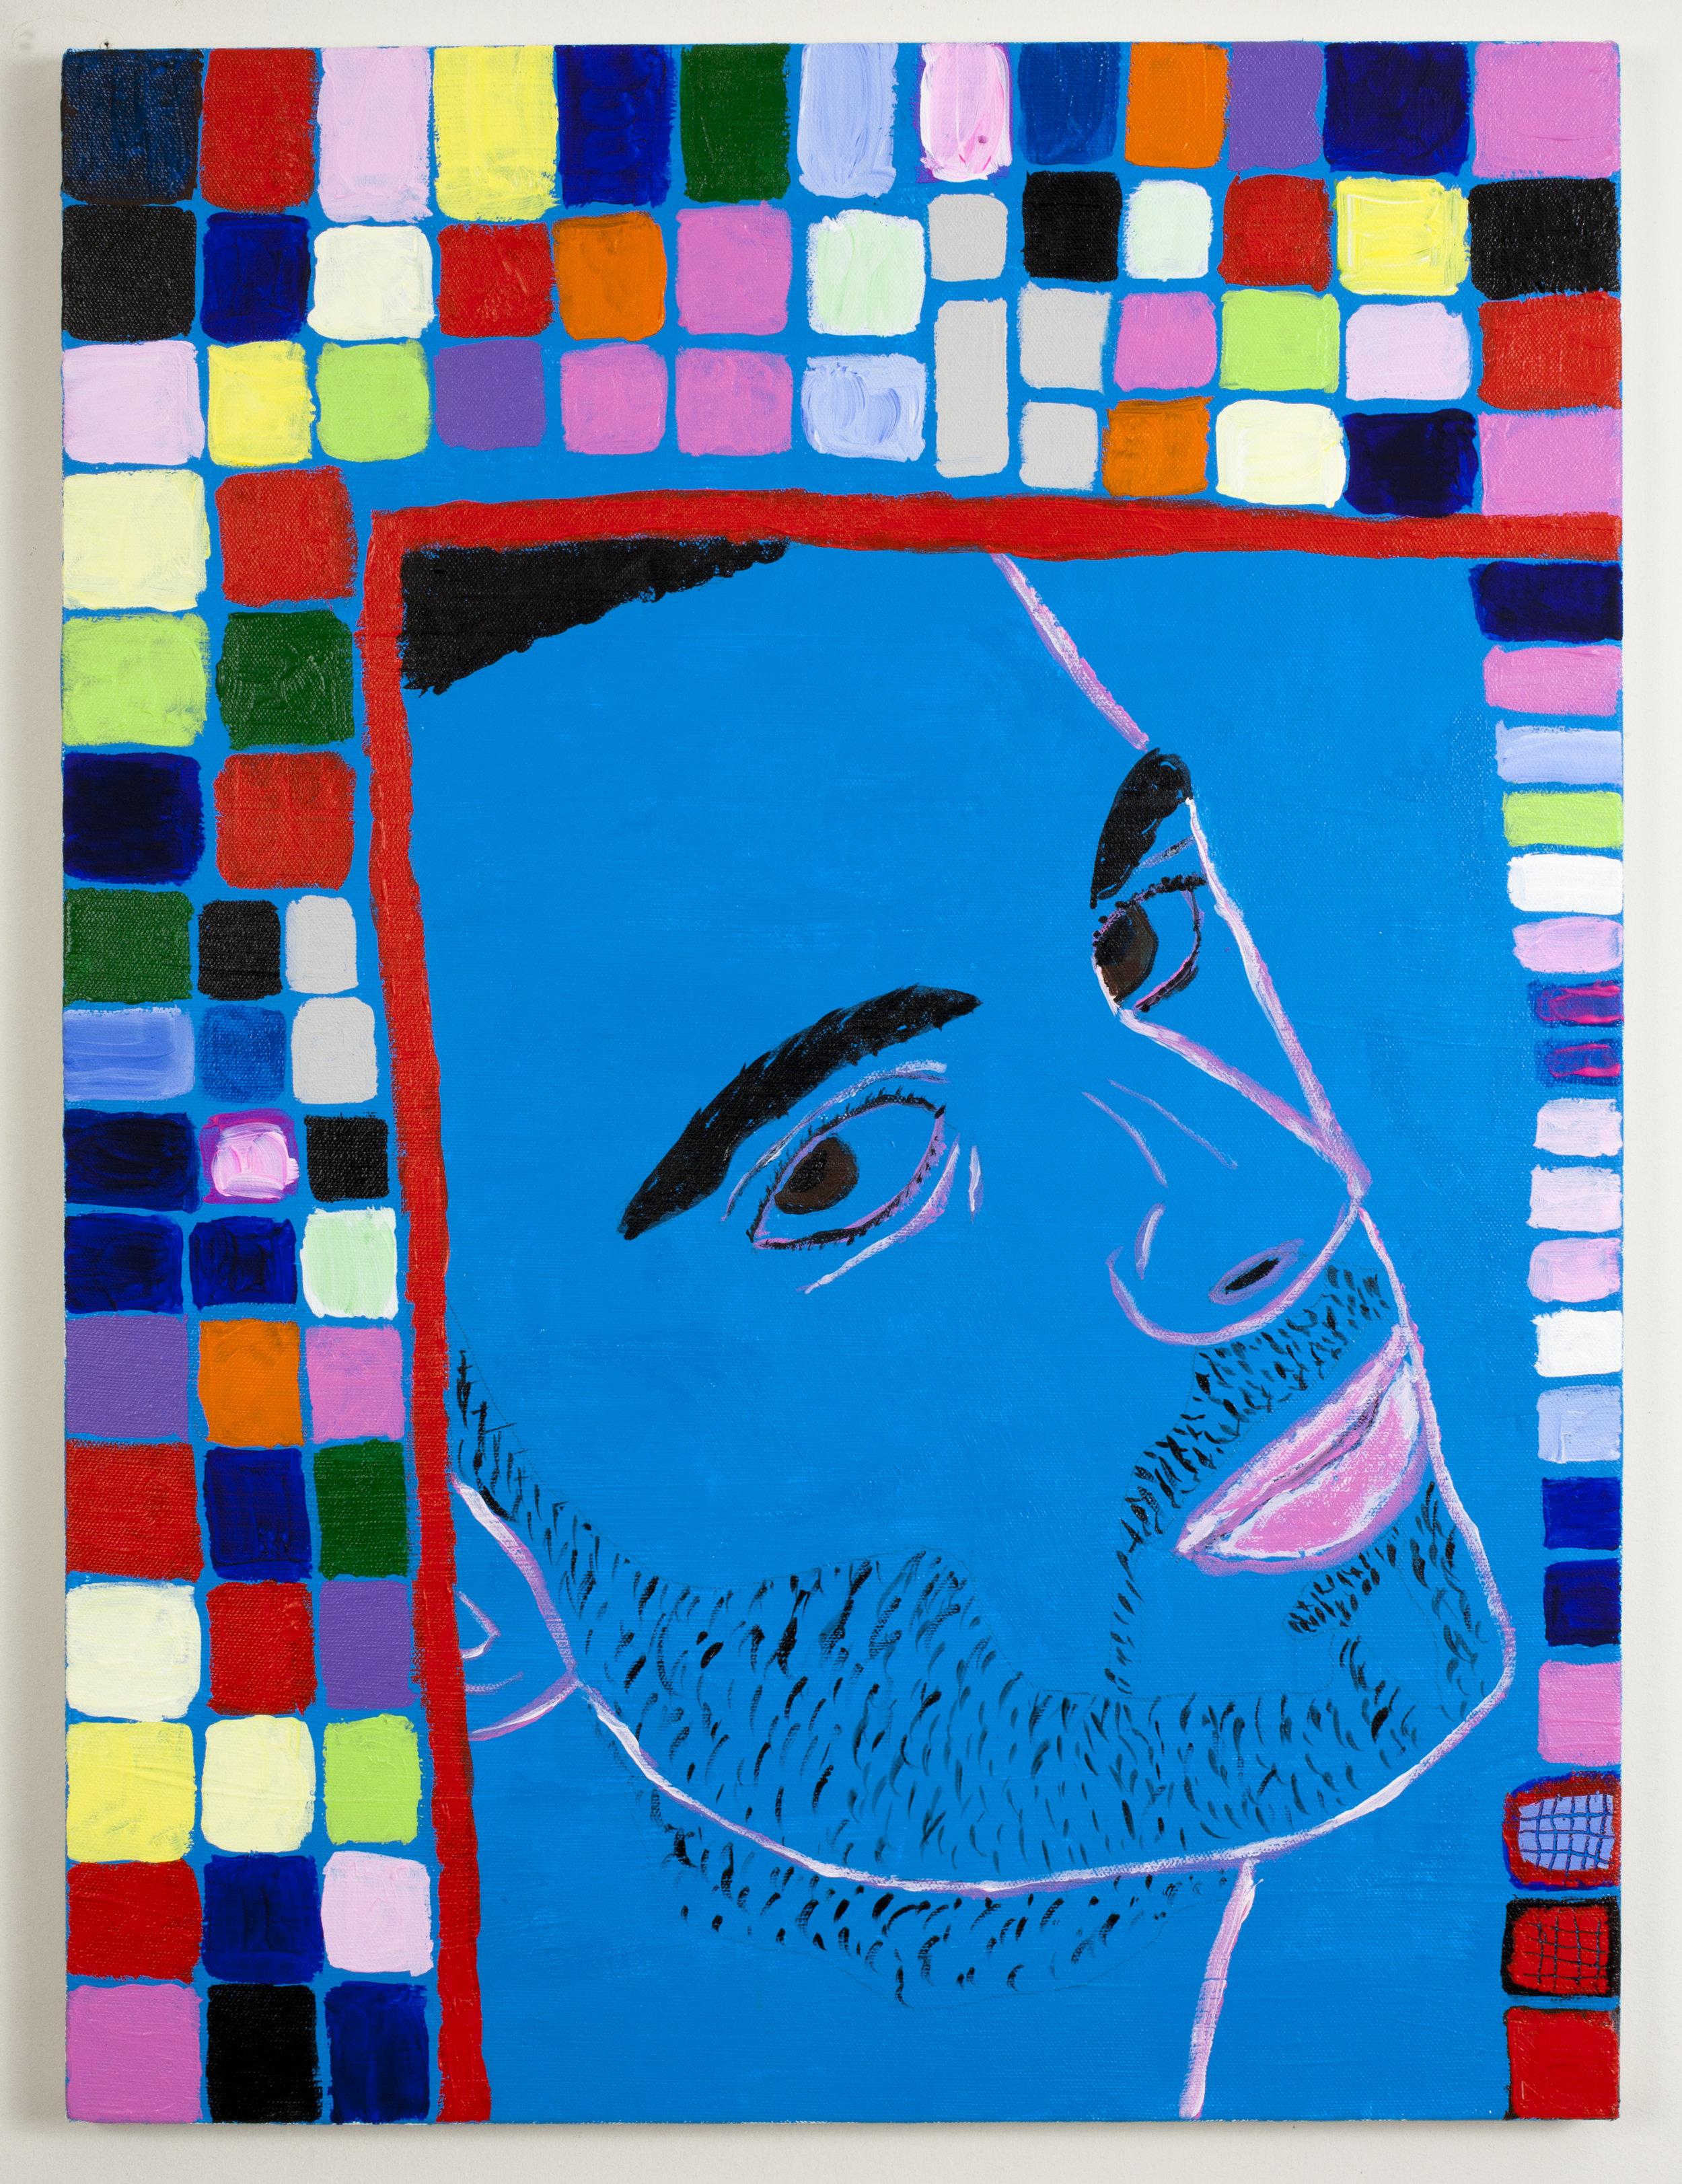 Blue Stranger with Mosaic Background  (2011)